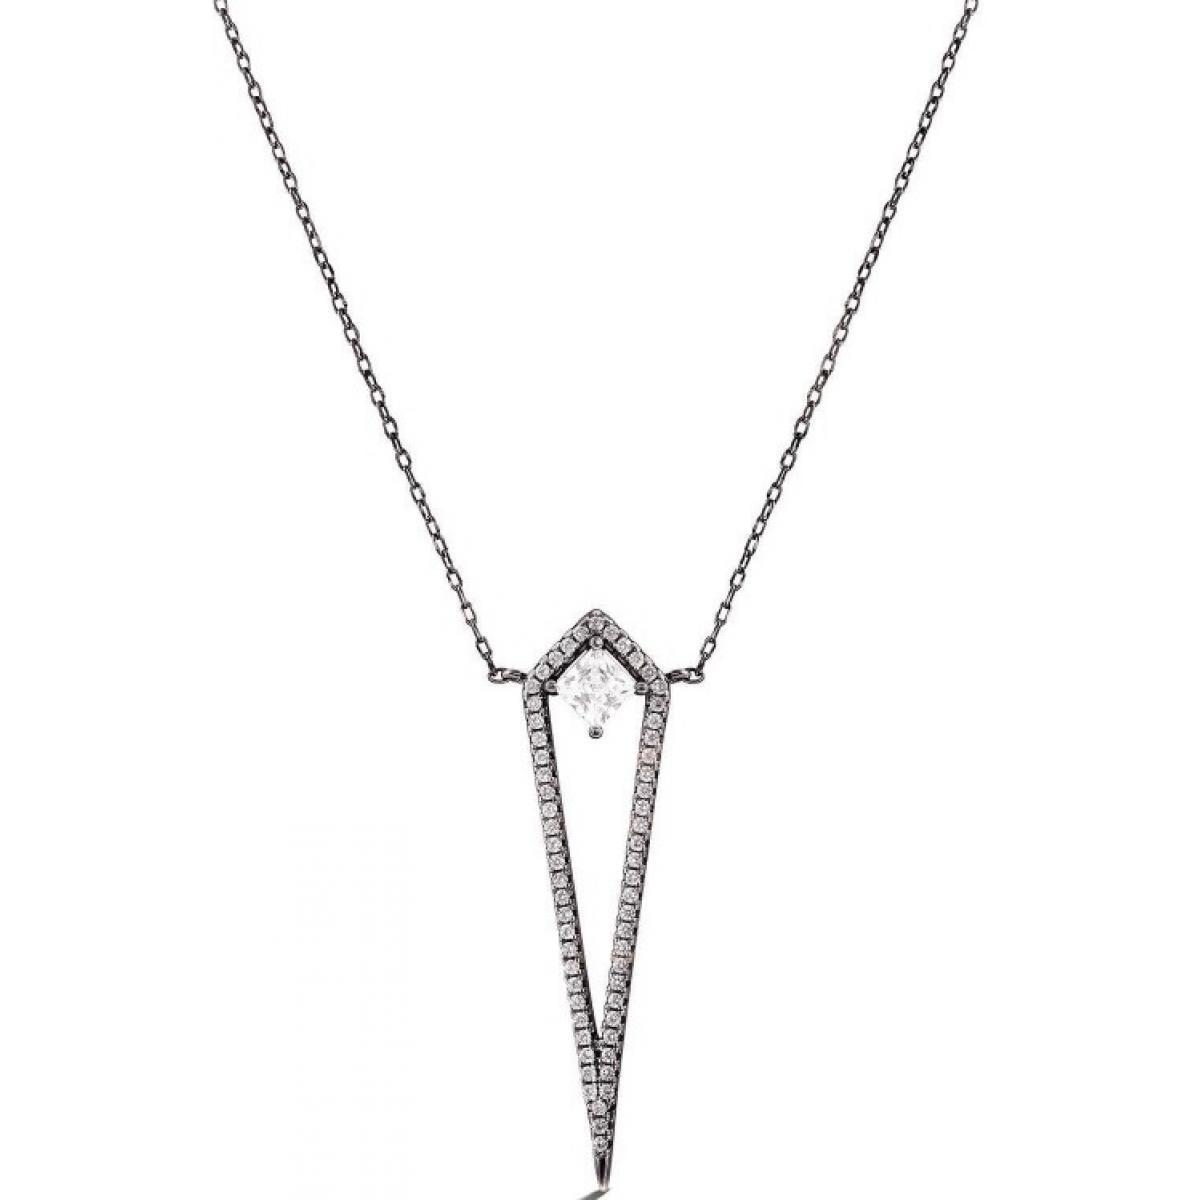 Collier et pendentif Luxenter PT068BK00 - Collier et pendentif MHORA Noir Serti Femme